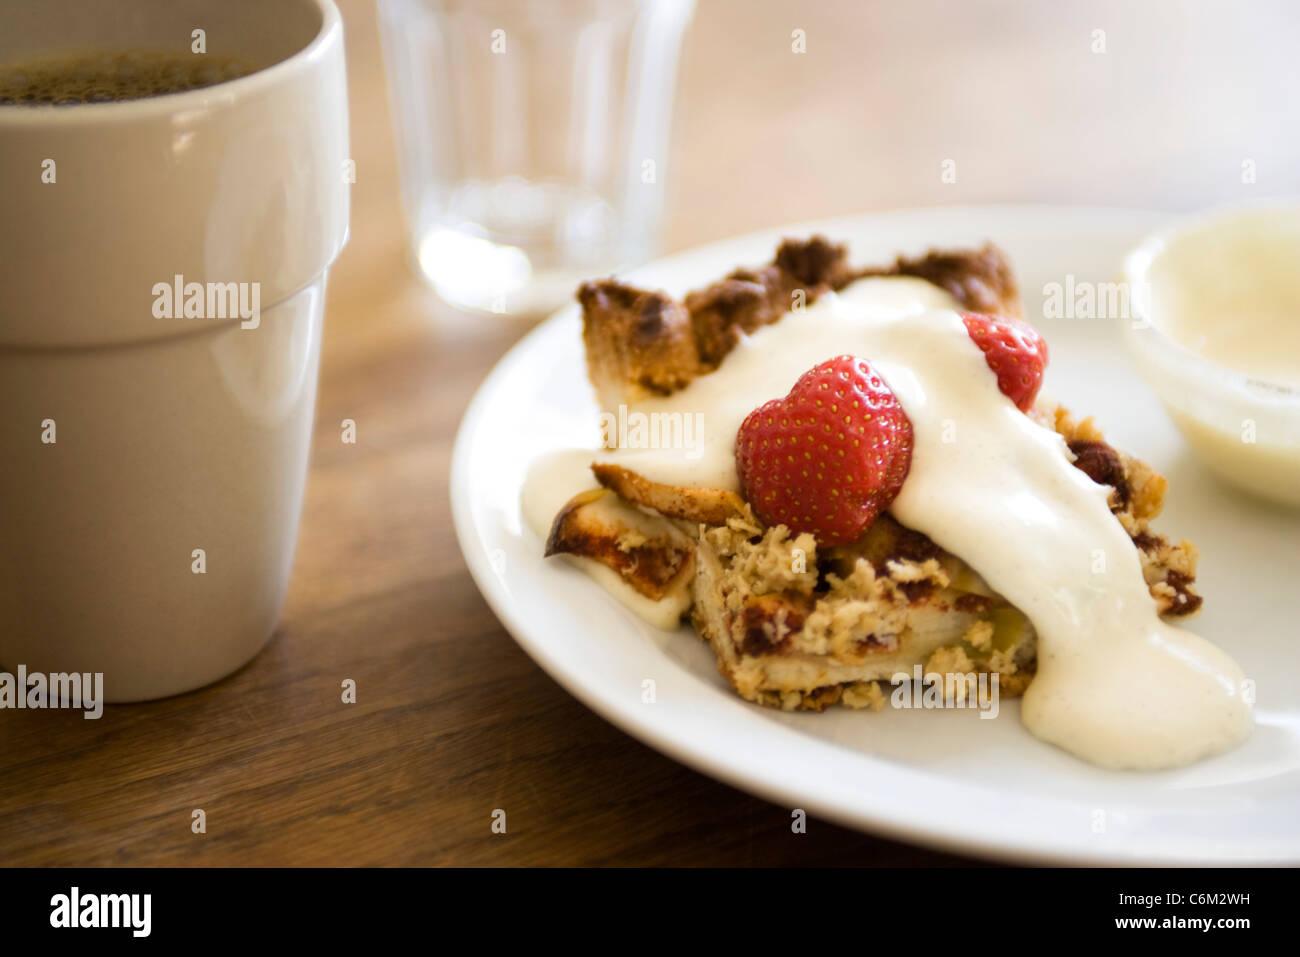 Apple pie with strawberries and vanilla cream - Stock Image